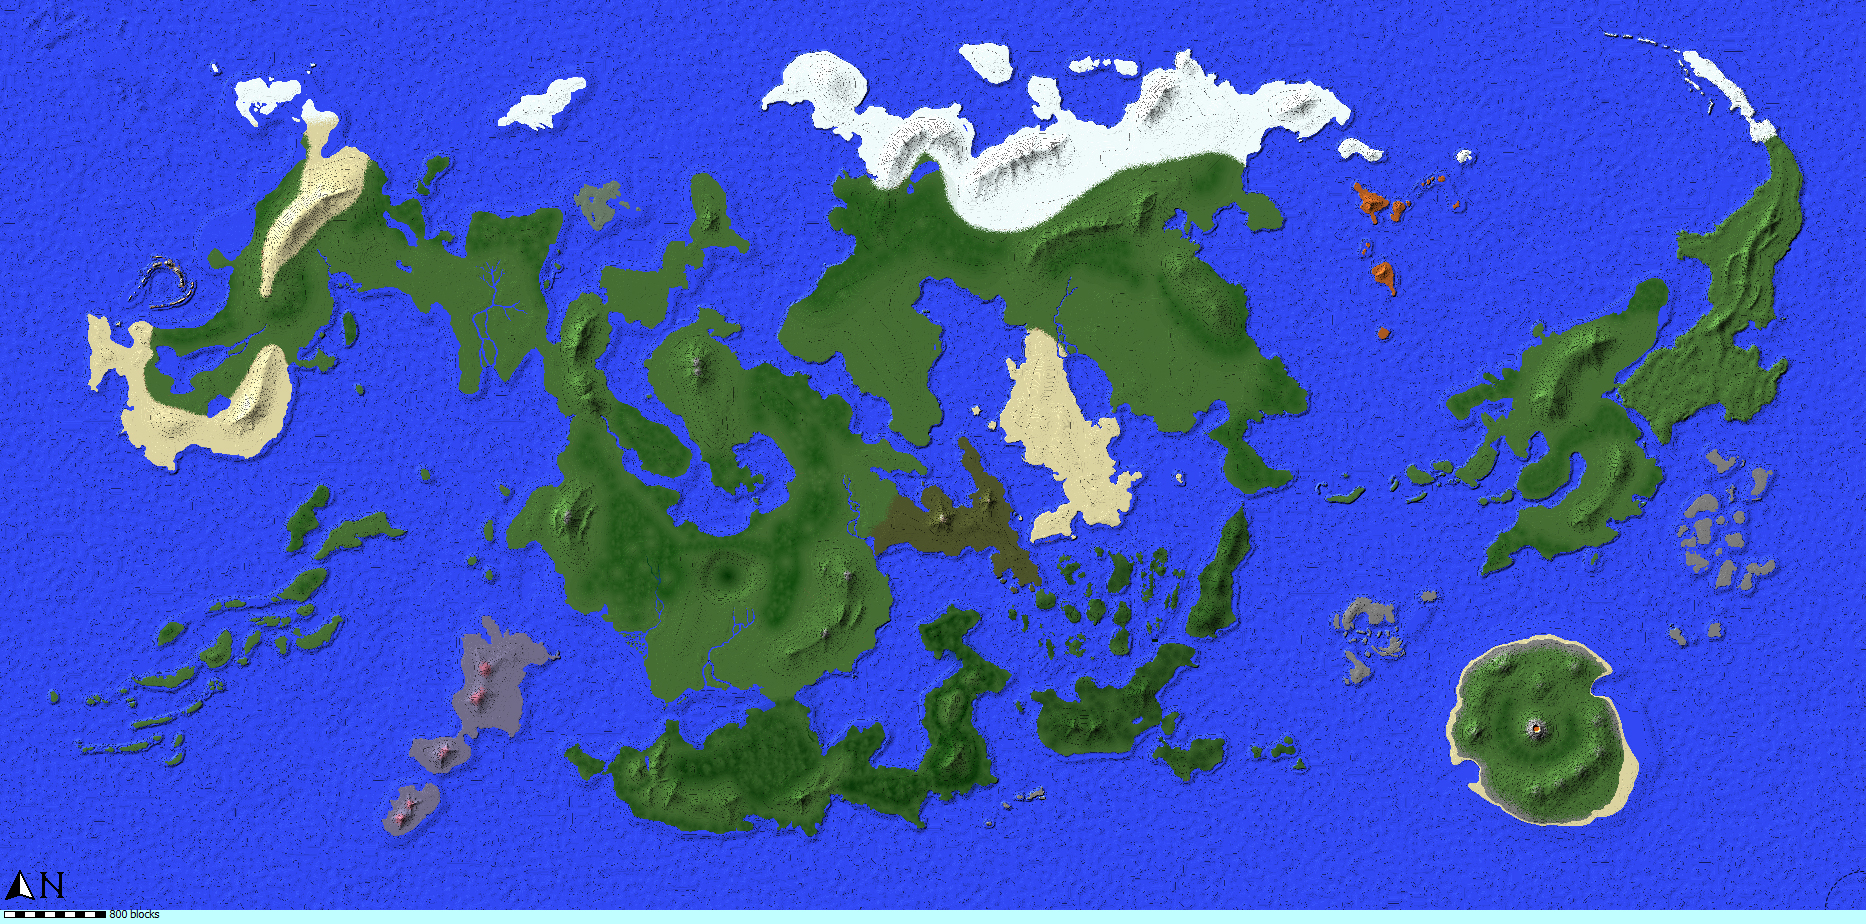 Minecraft Map World Painter Island